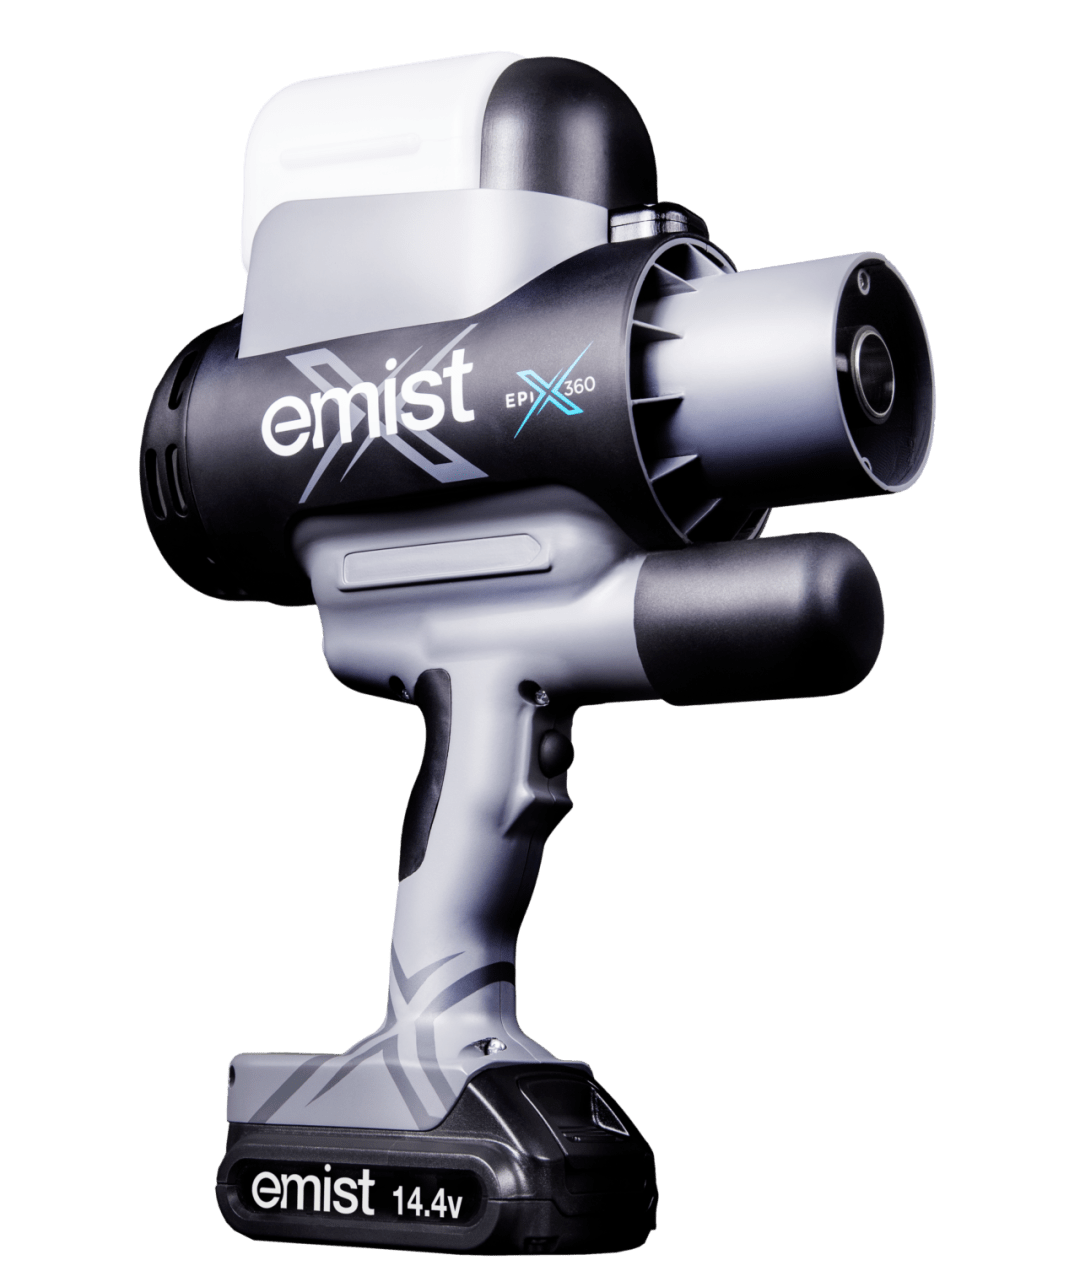 EPIX360™ Handheld